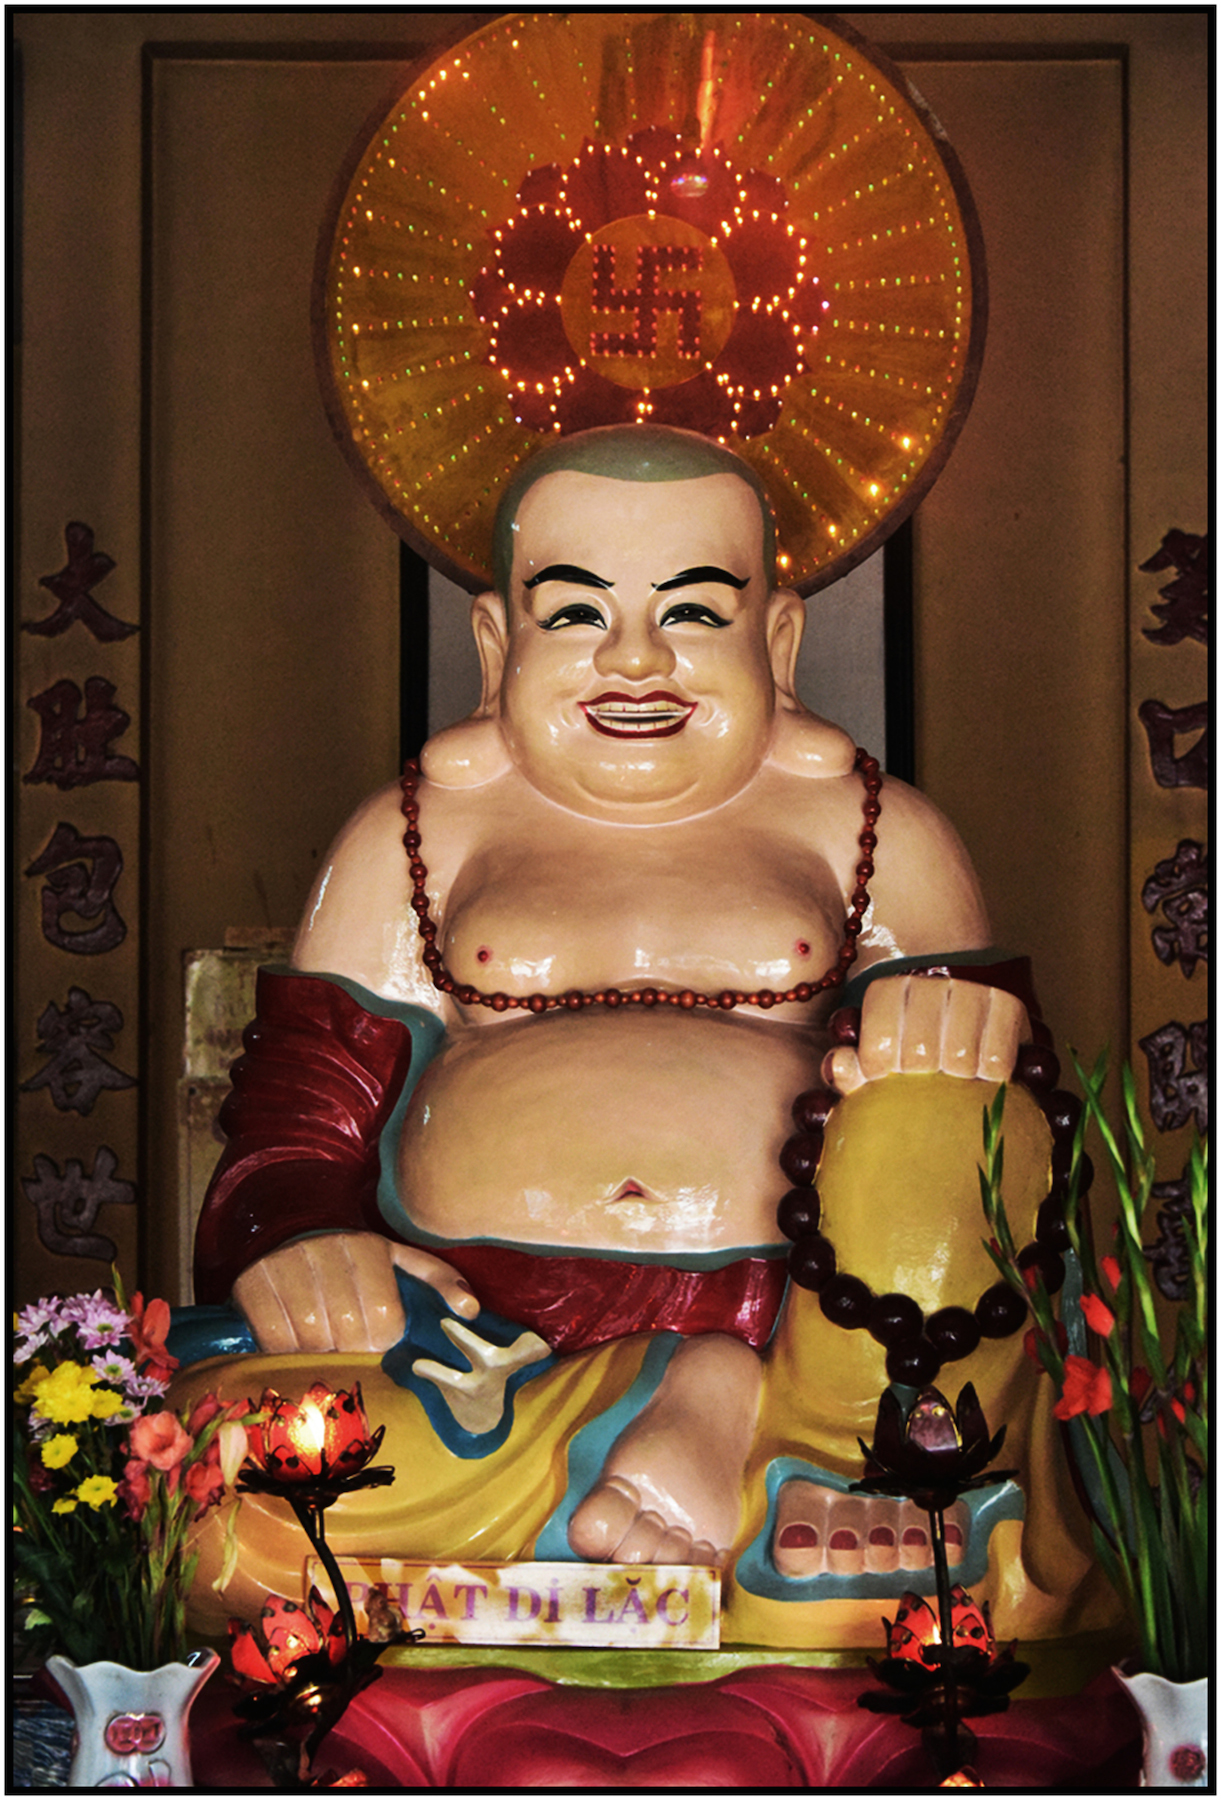 """Great Man"" Buddhist Temple, Saigon/HCMC, Dec. 2015 #4447"